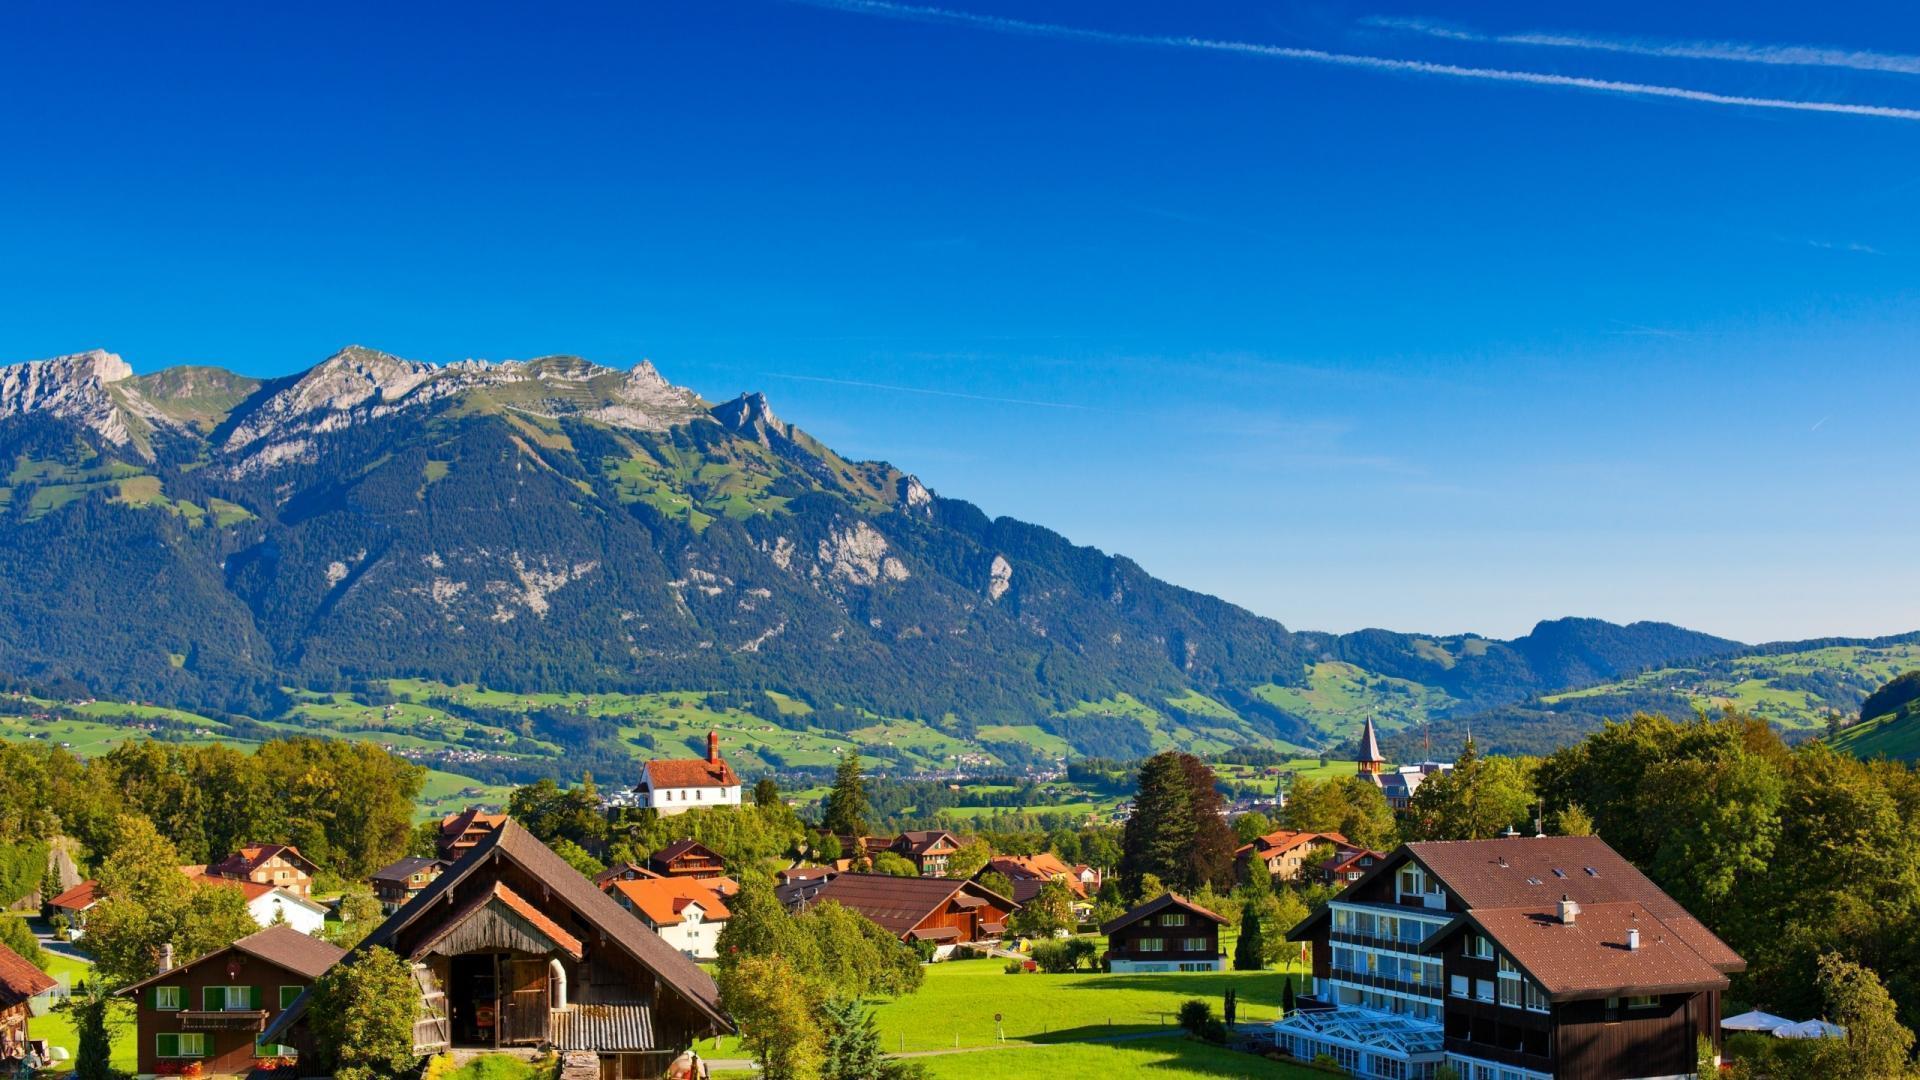 Swiss Alps Wallpapers Wallpaper Cave